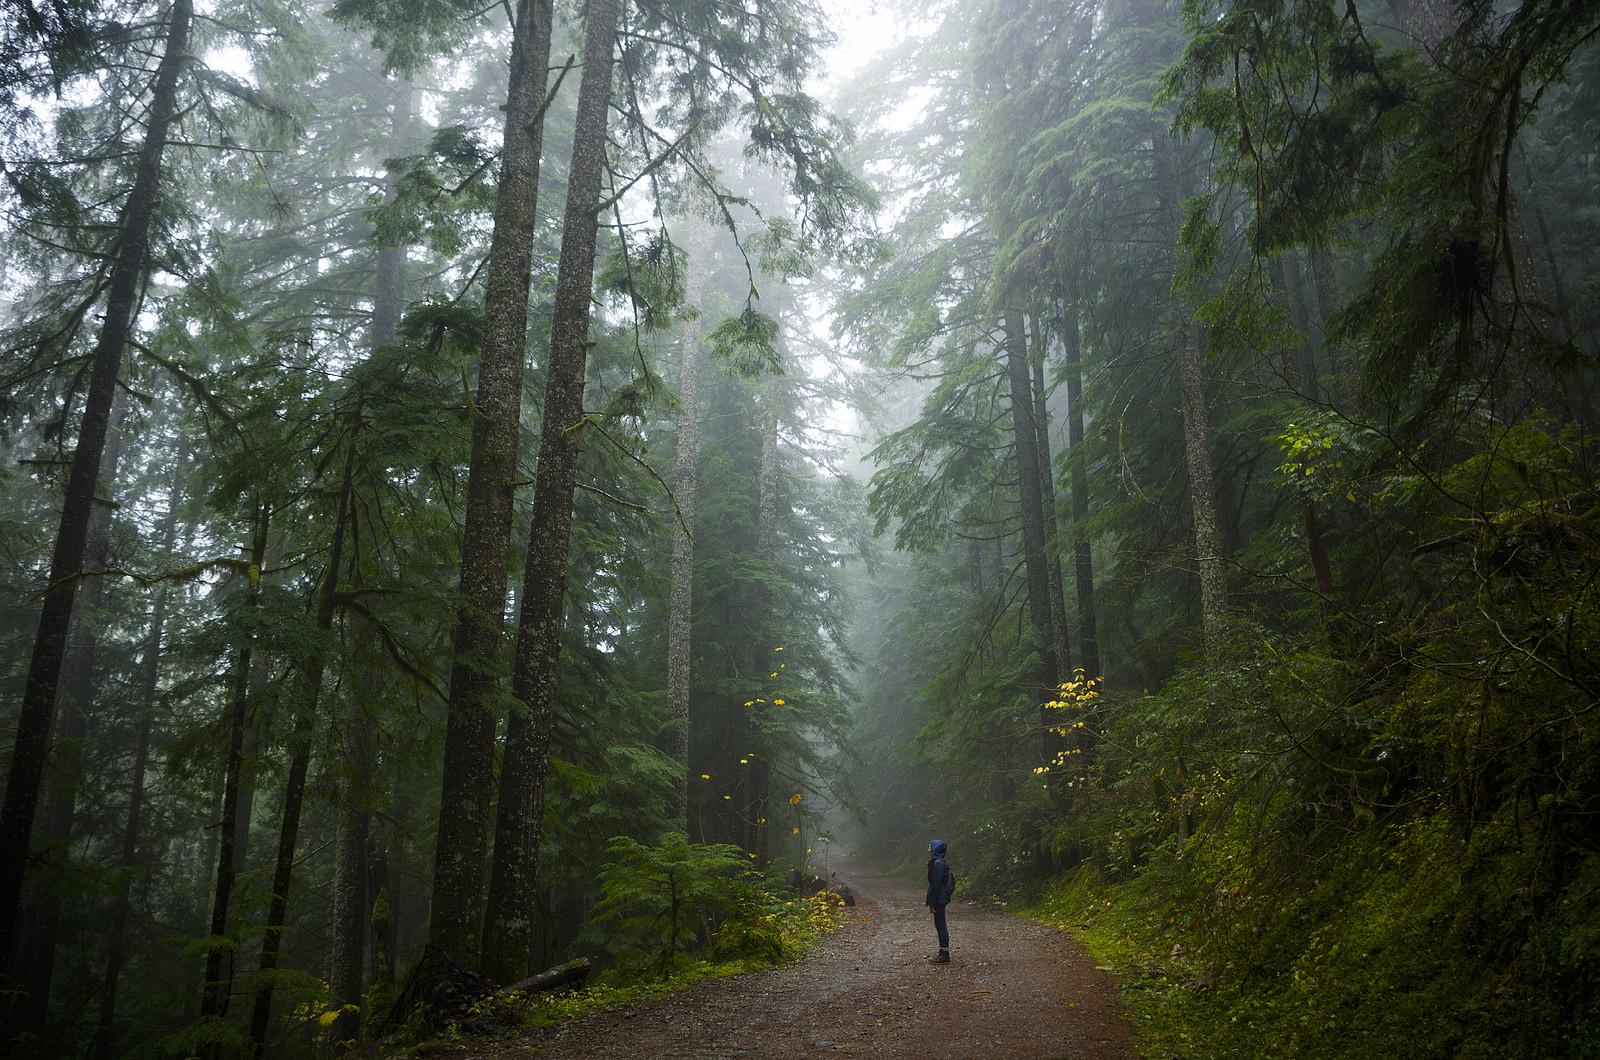 Michigan Fall Wallpaper You Ll Never Forget This Enchanting Hike Along Oregon S